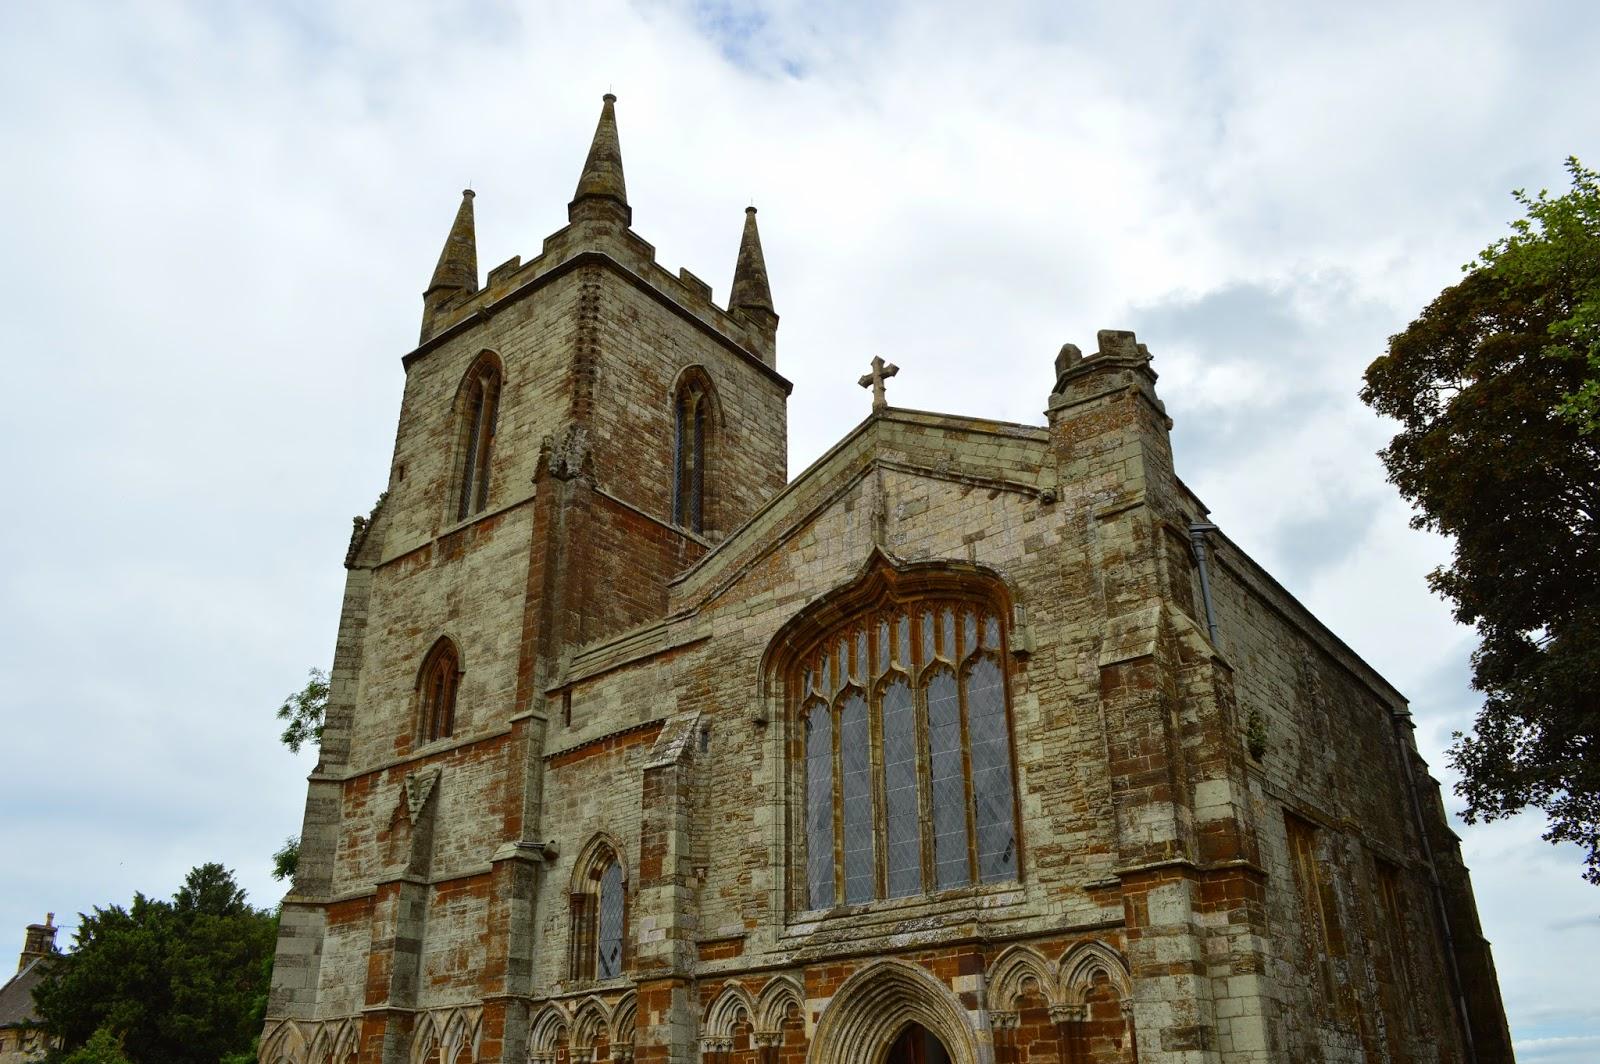 Canons Ashby, historical building, House and gardens, Drydan family, garden, Tudor brick, Jacobean Plaster, travel lodge, shepherd boy statue, photo, photograph, visit, day trip, church, priory